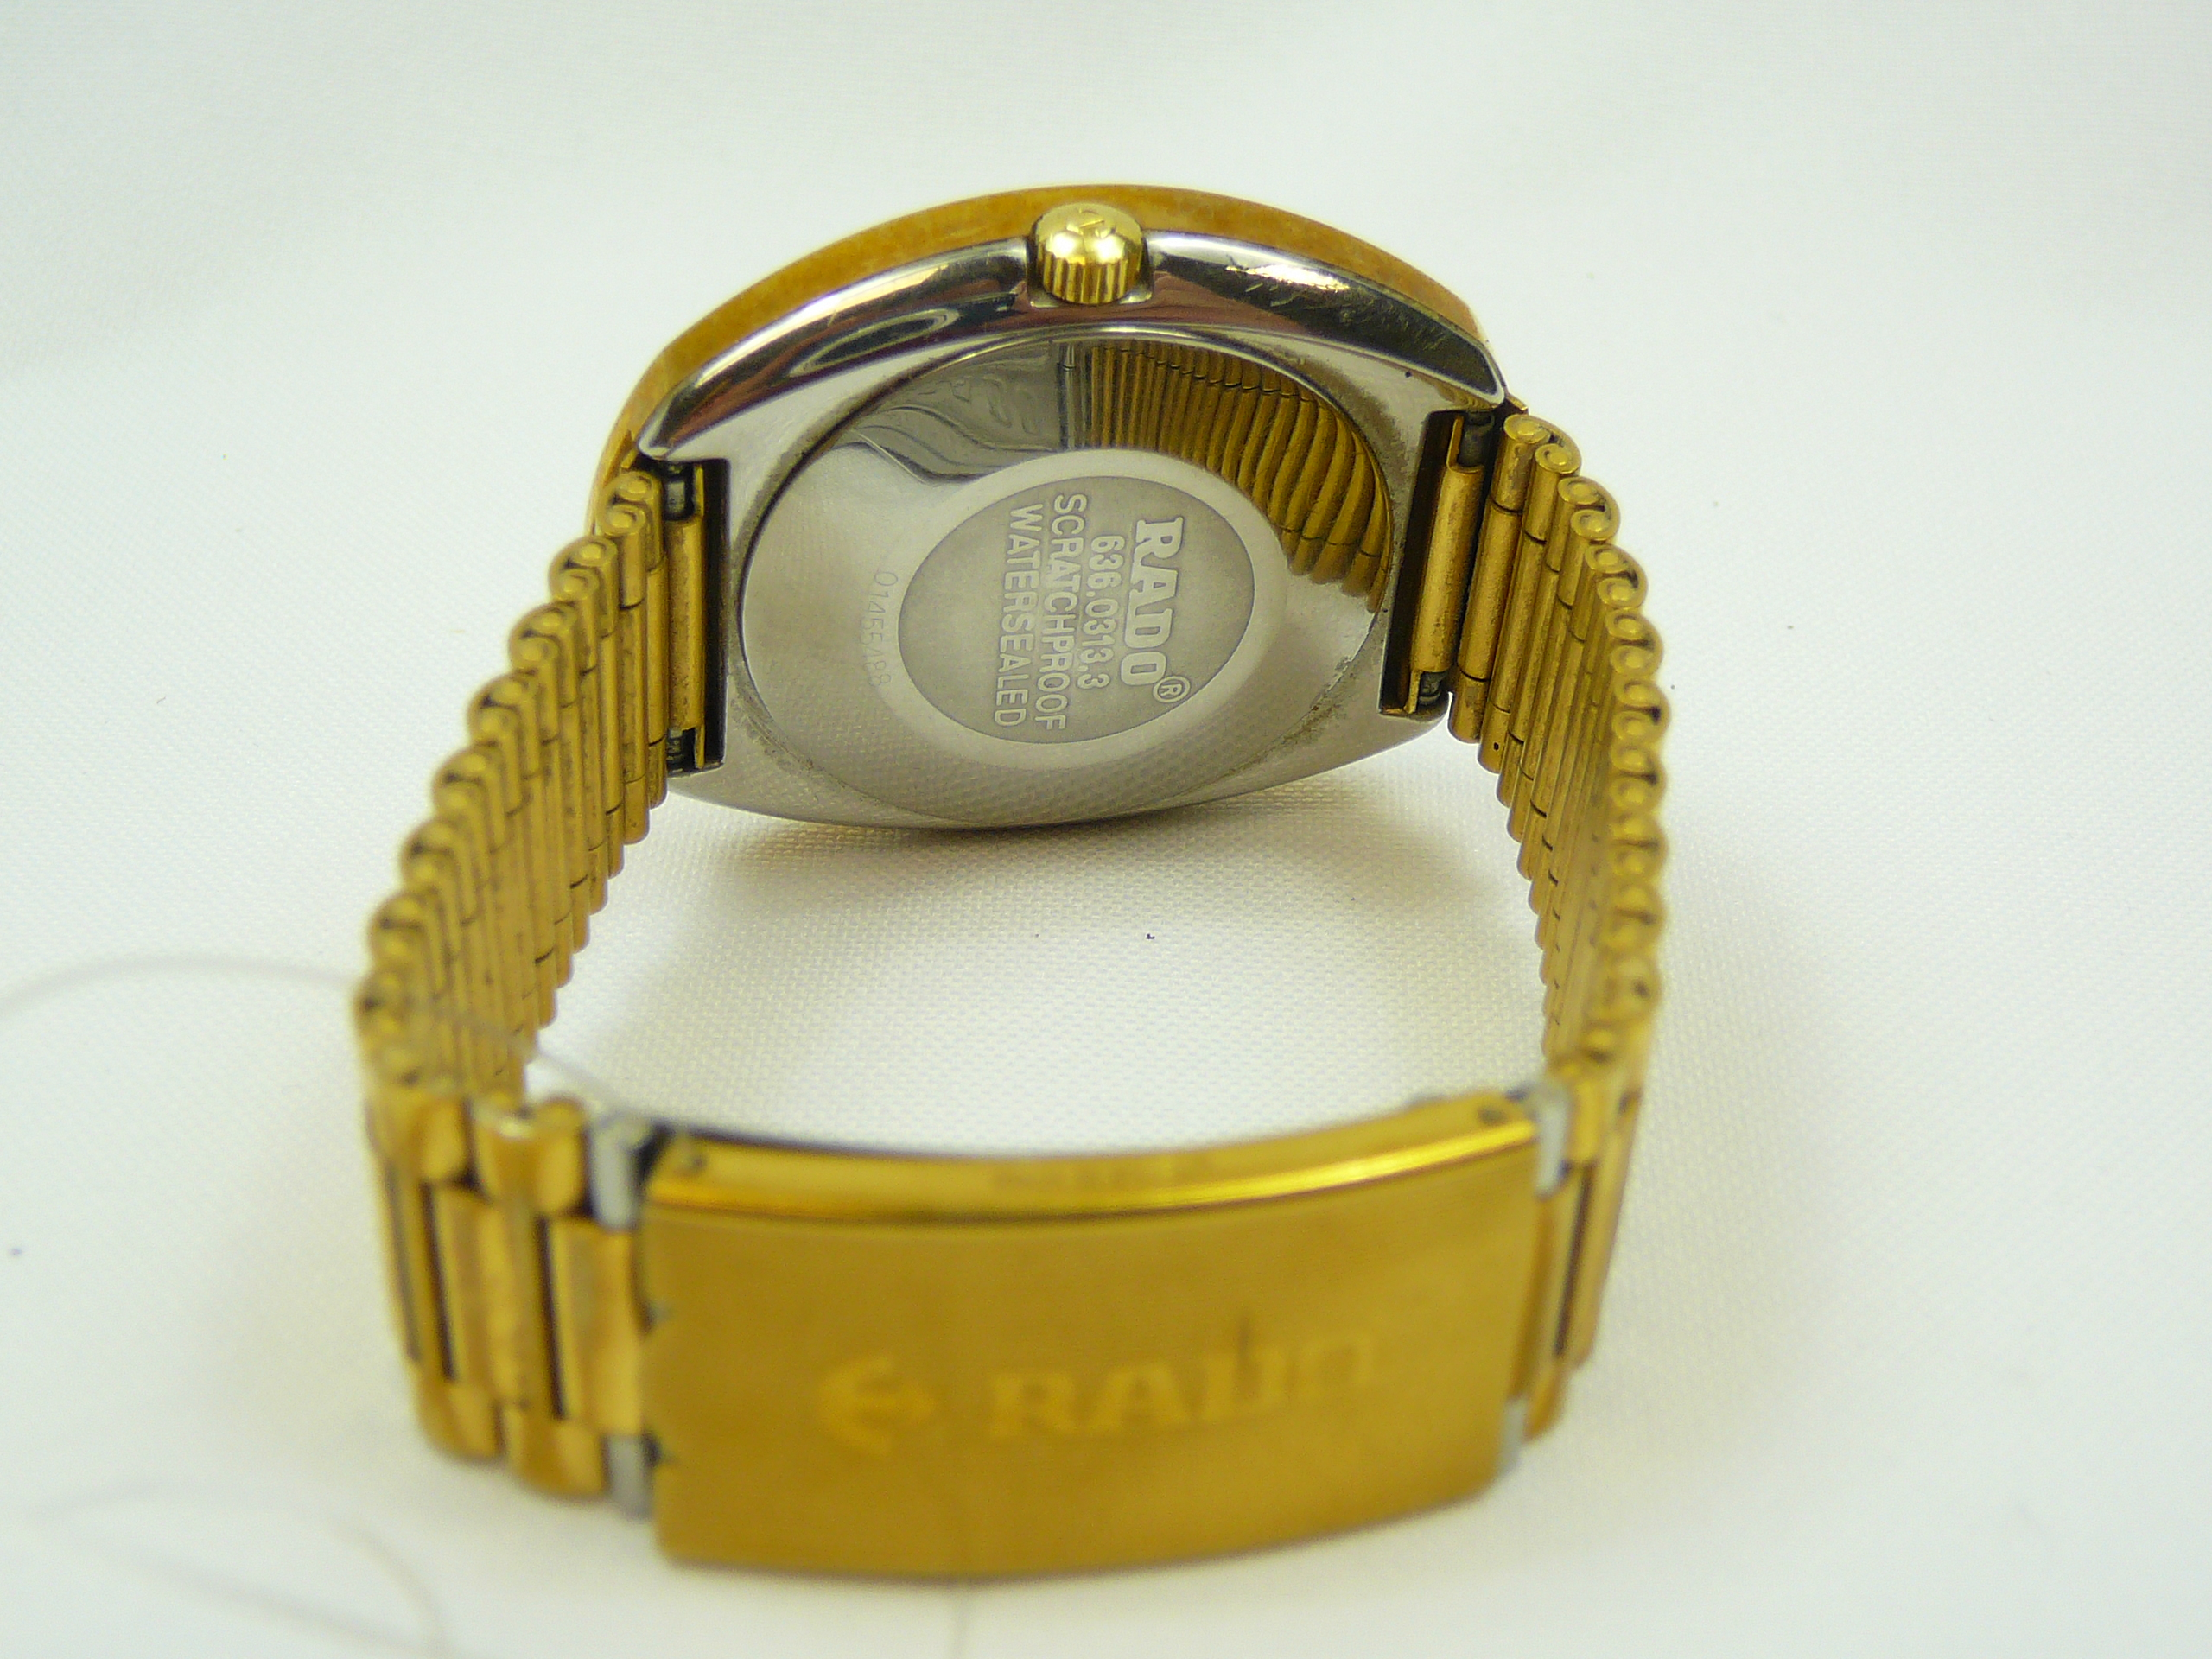 Gents Rado Wrist Watch - Image 3 of 3